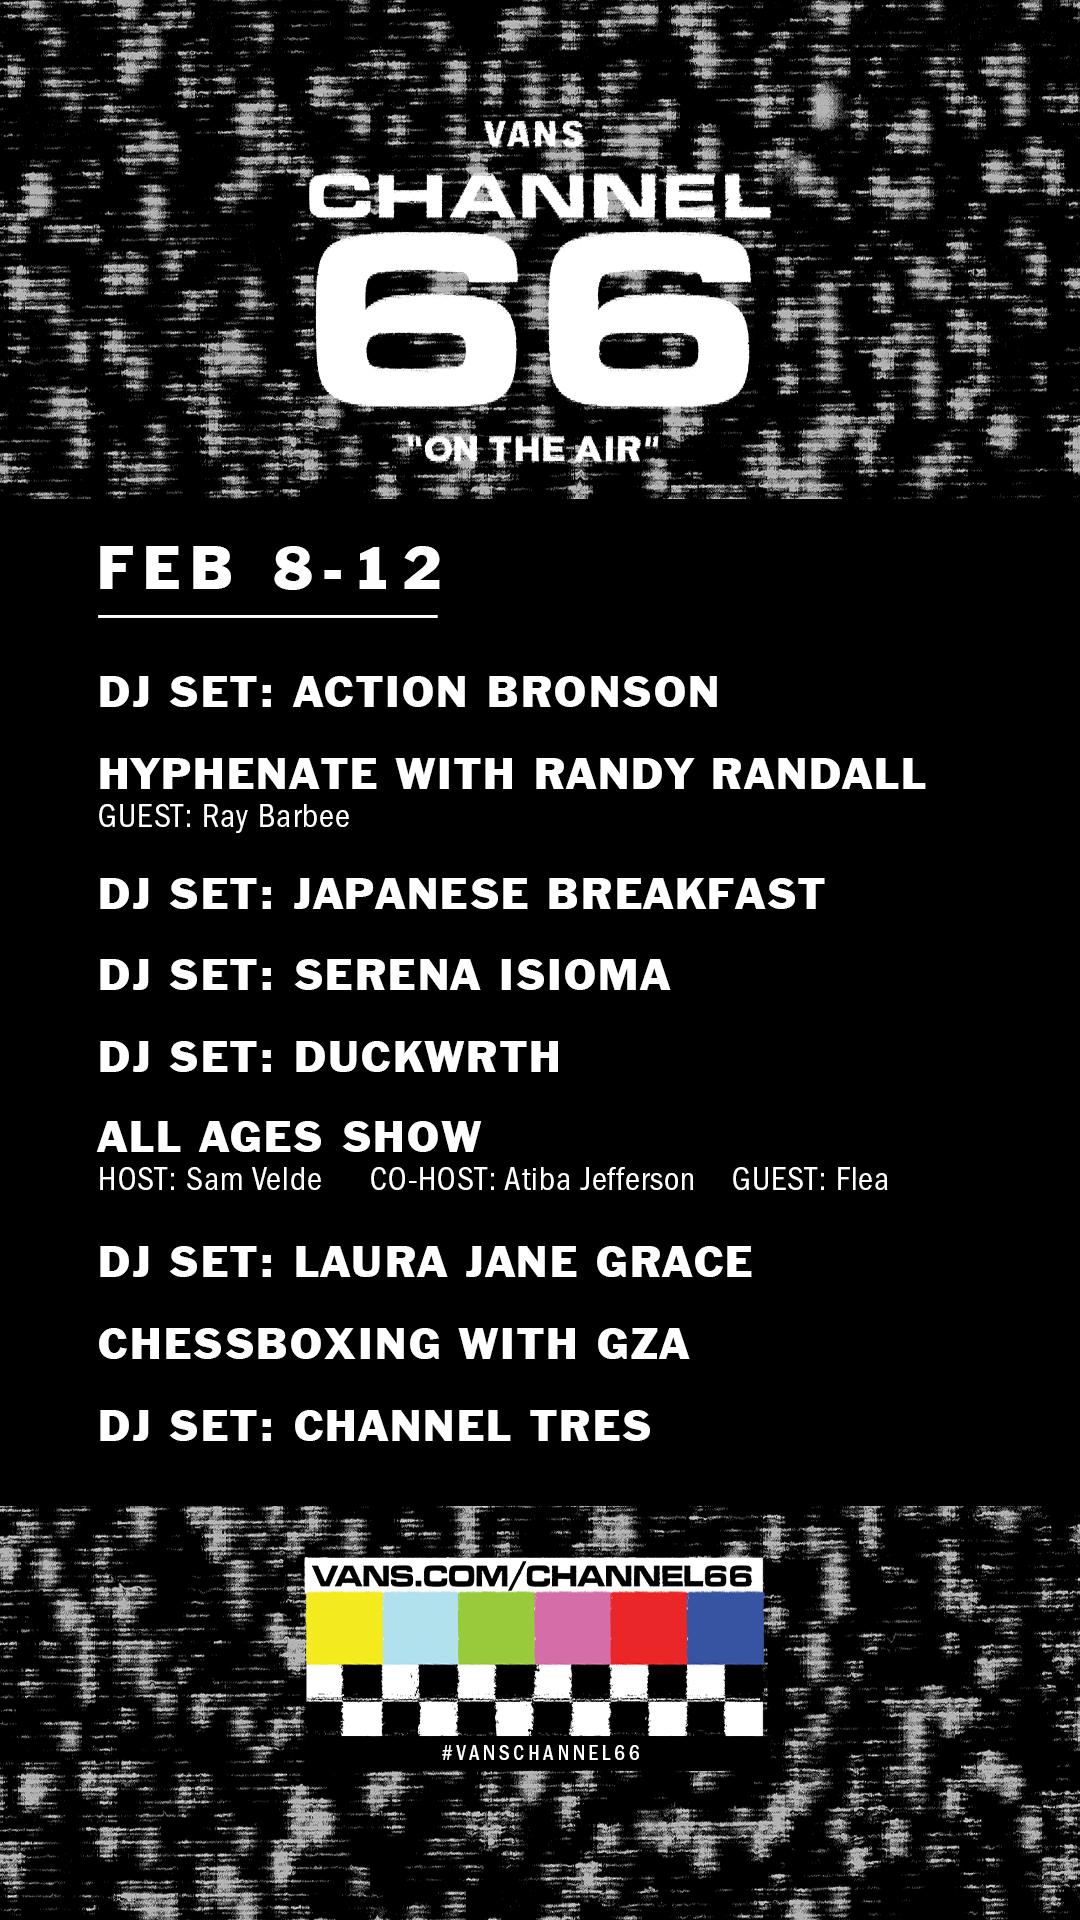 Schedule_Generic_Week01_Story_Revised vans channel 66 livestream schedule